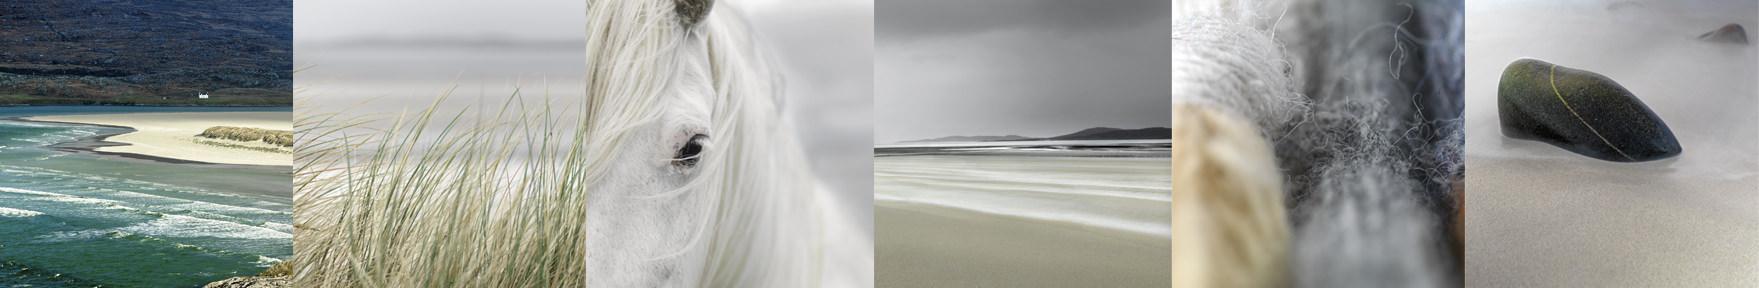 Ian Lawson - Photography